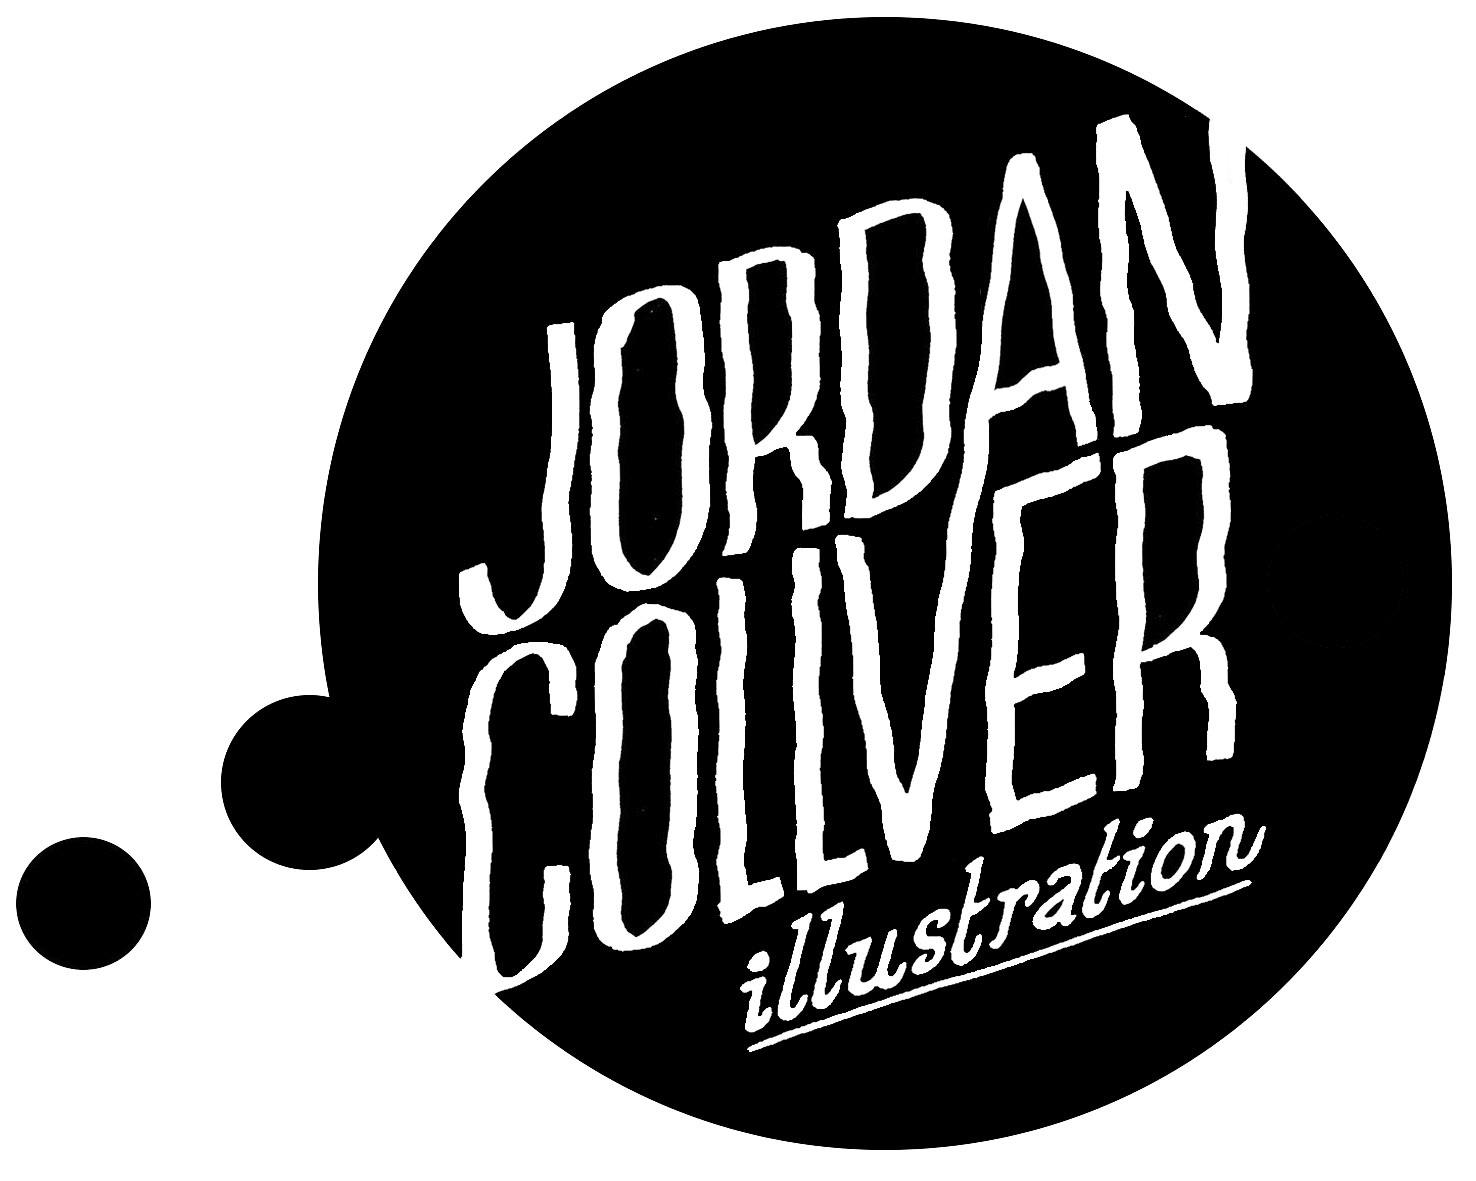 Jordan Collver